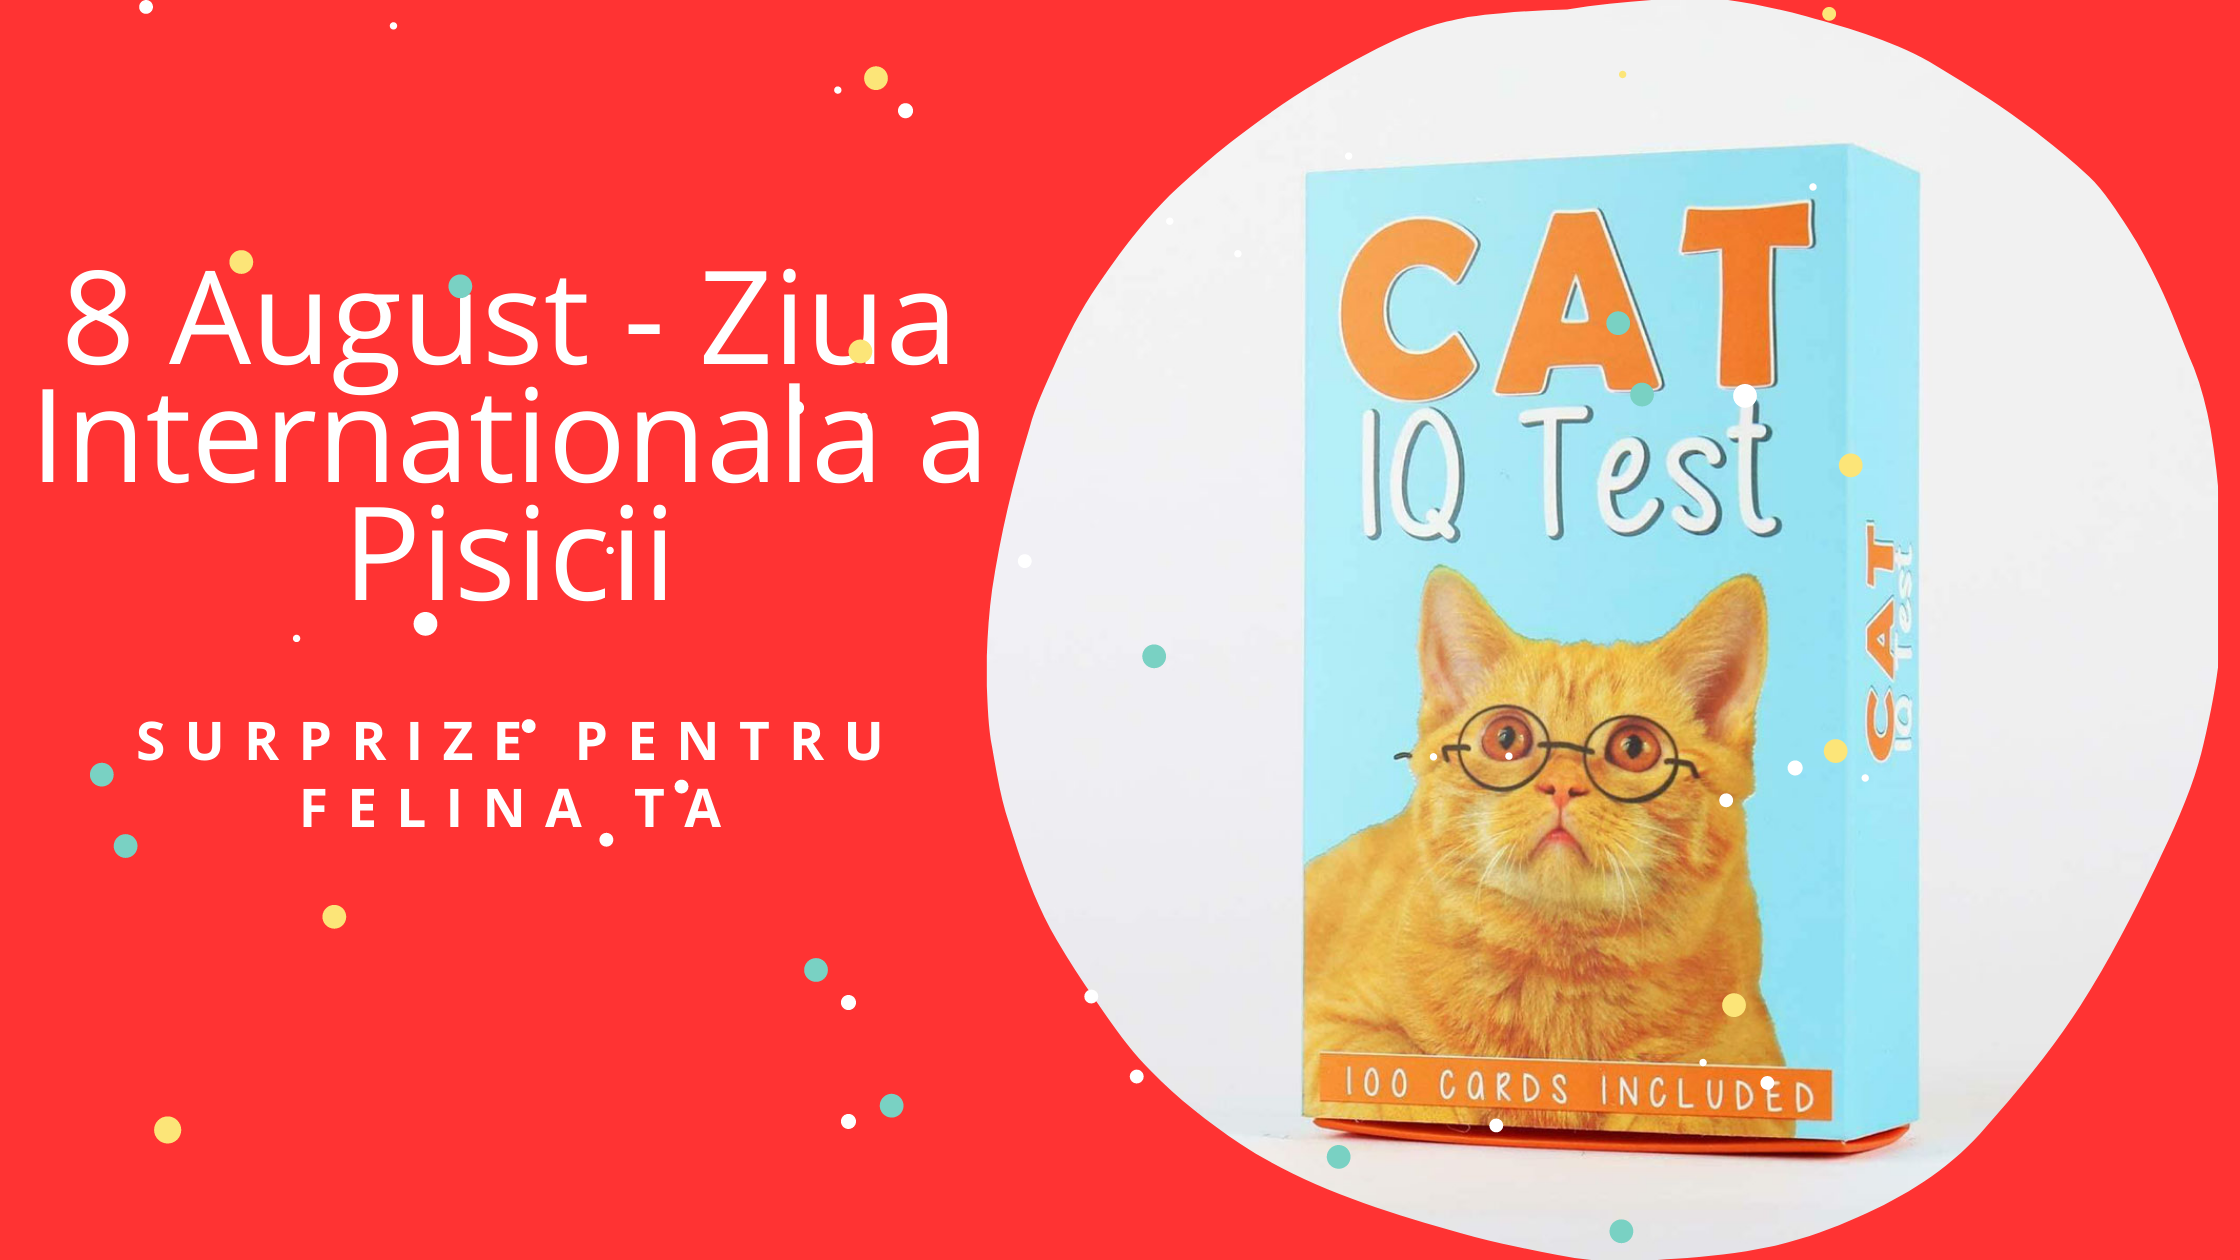 8 August - Ziua Internationala a Pisicii